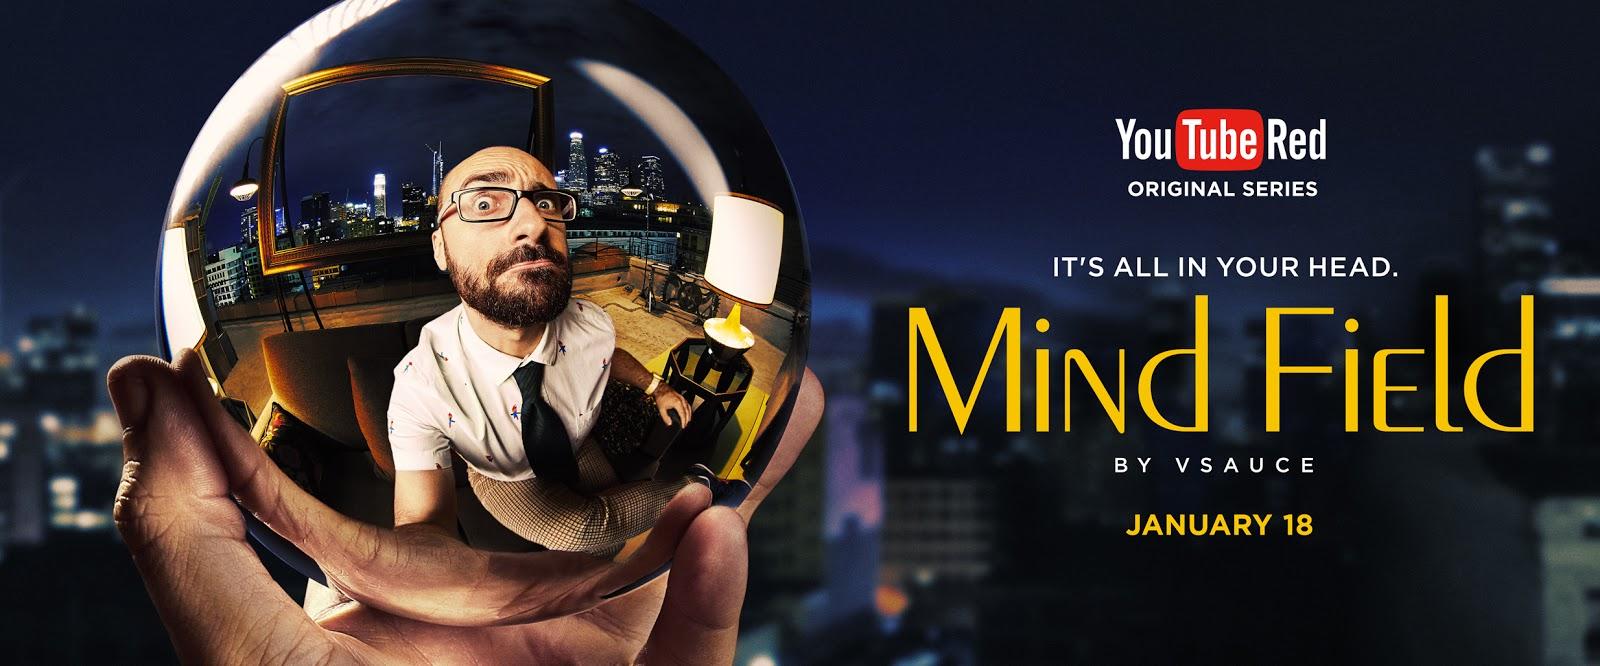 mind-field-yto_MindField_en_2880x1200_133_V2_date_rgb.jpg